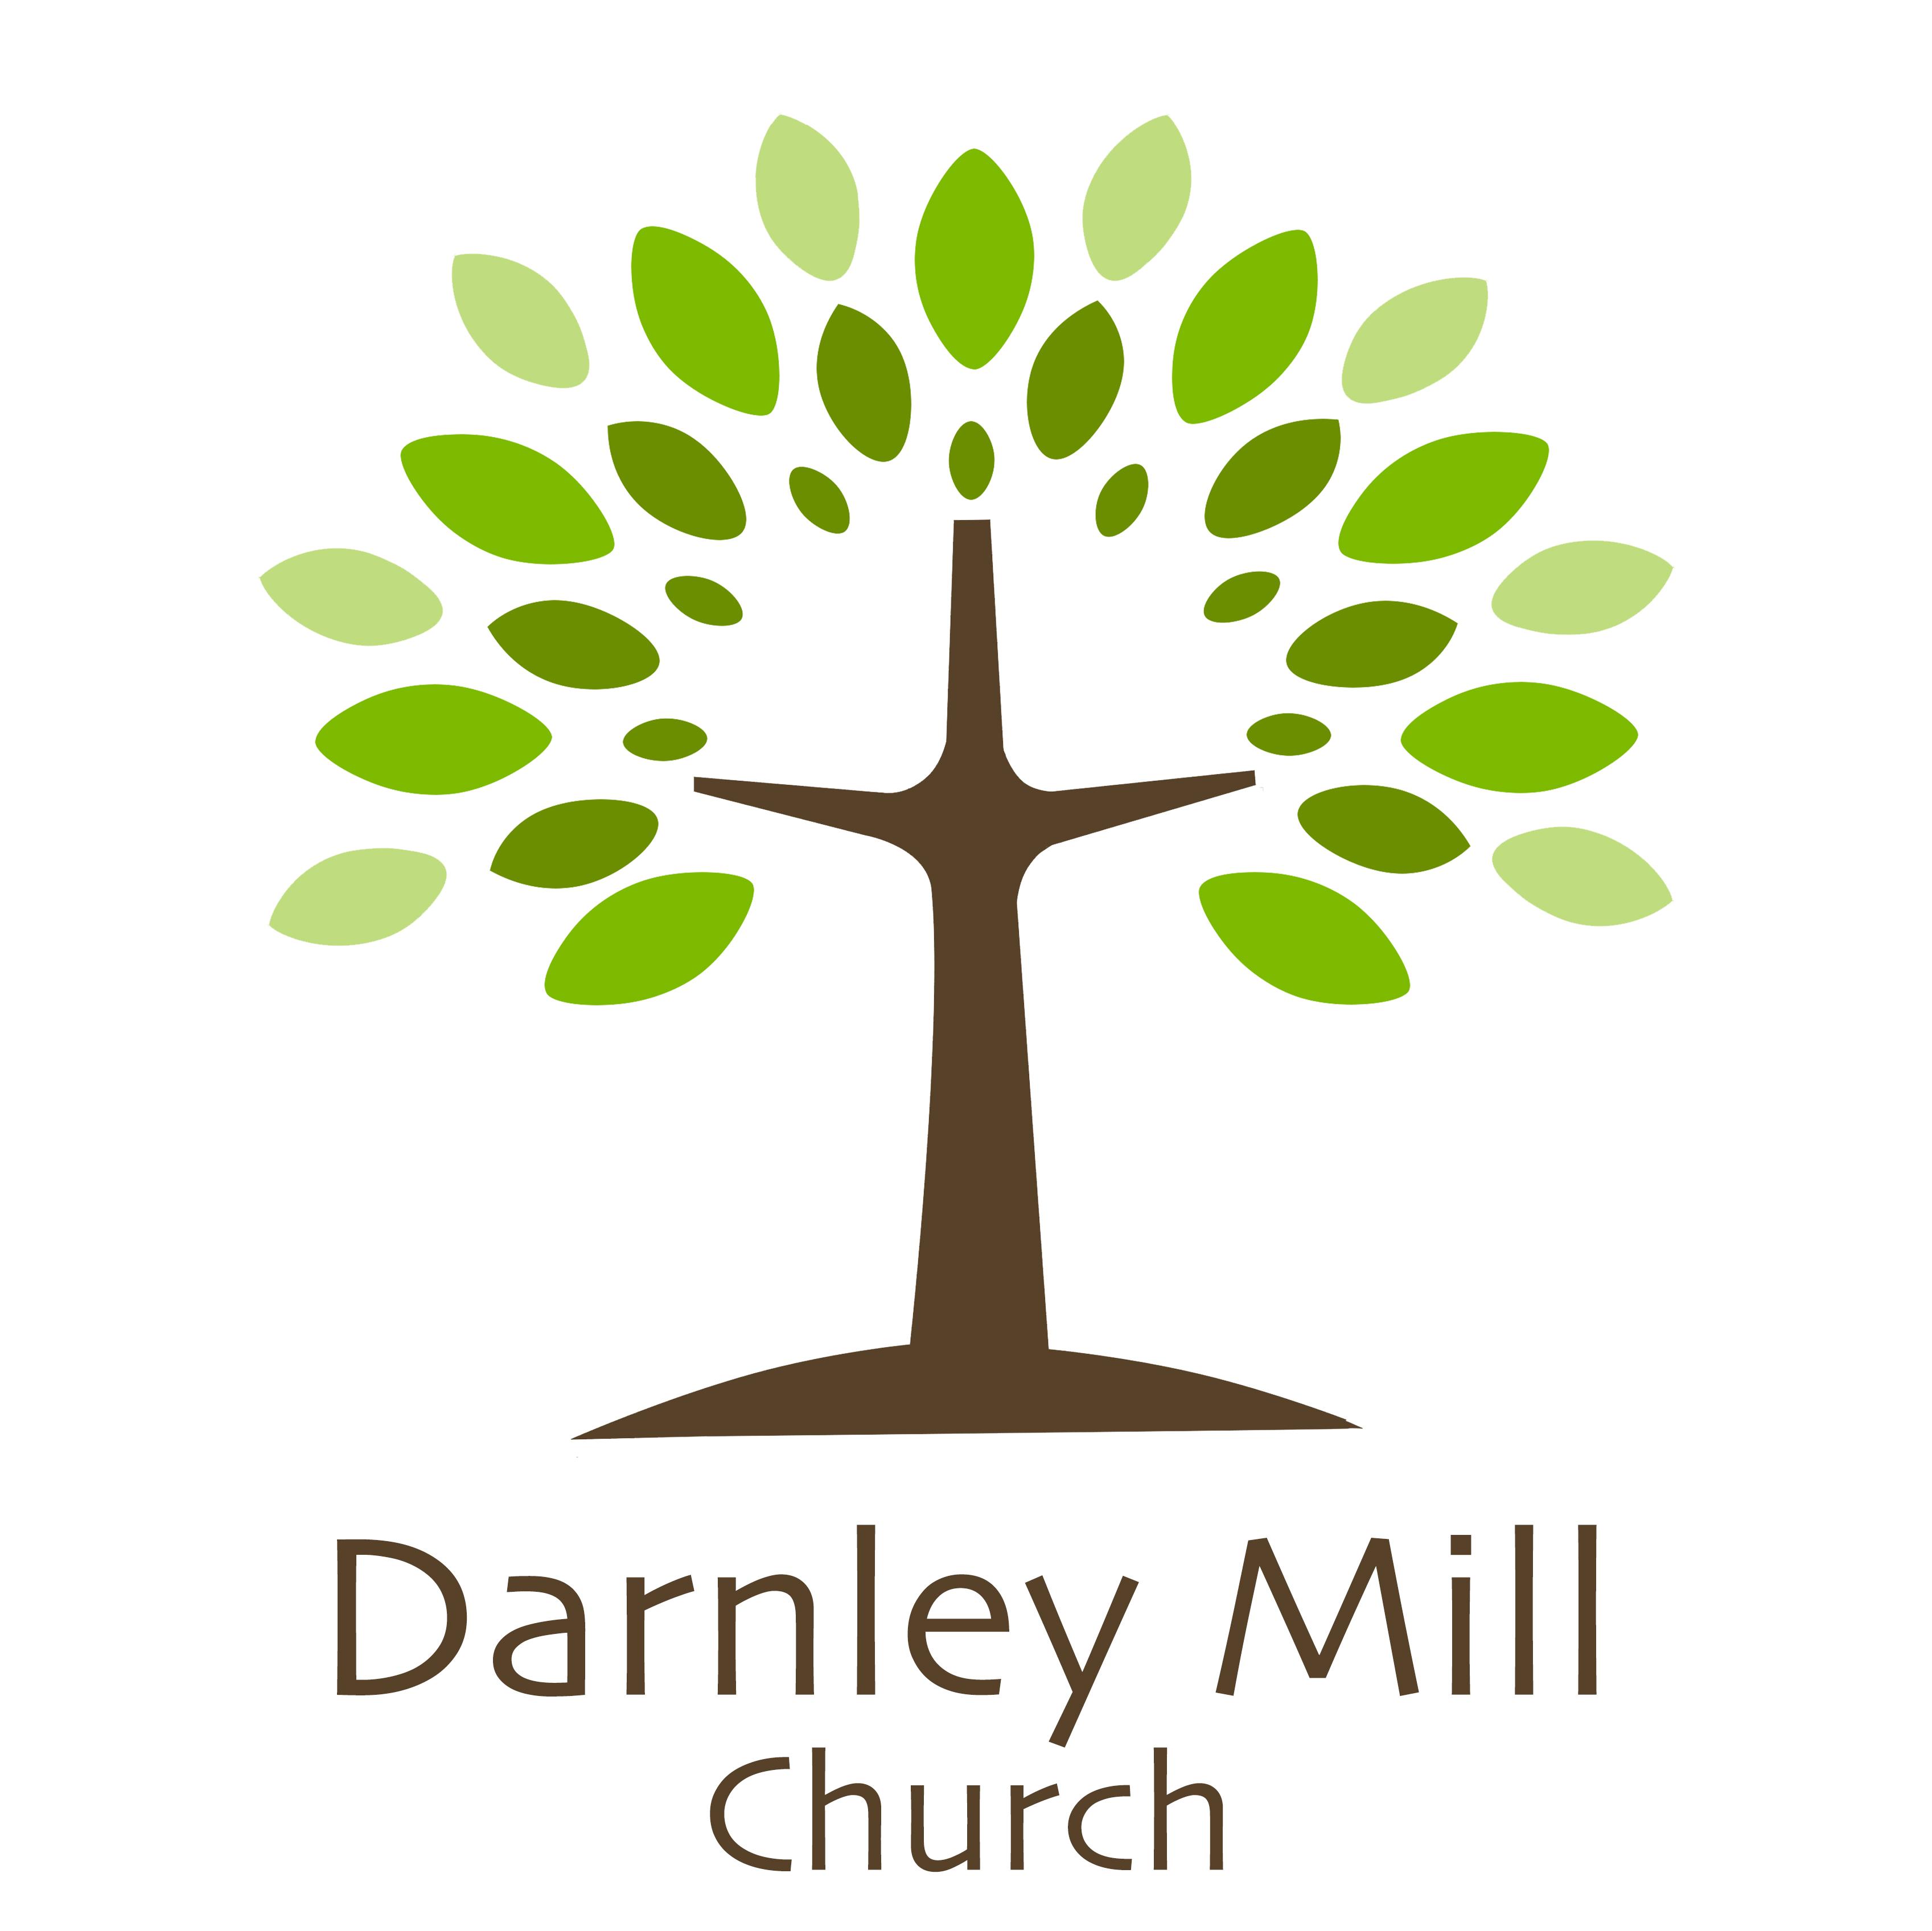 Darnley Mill Church